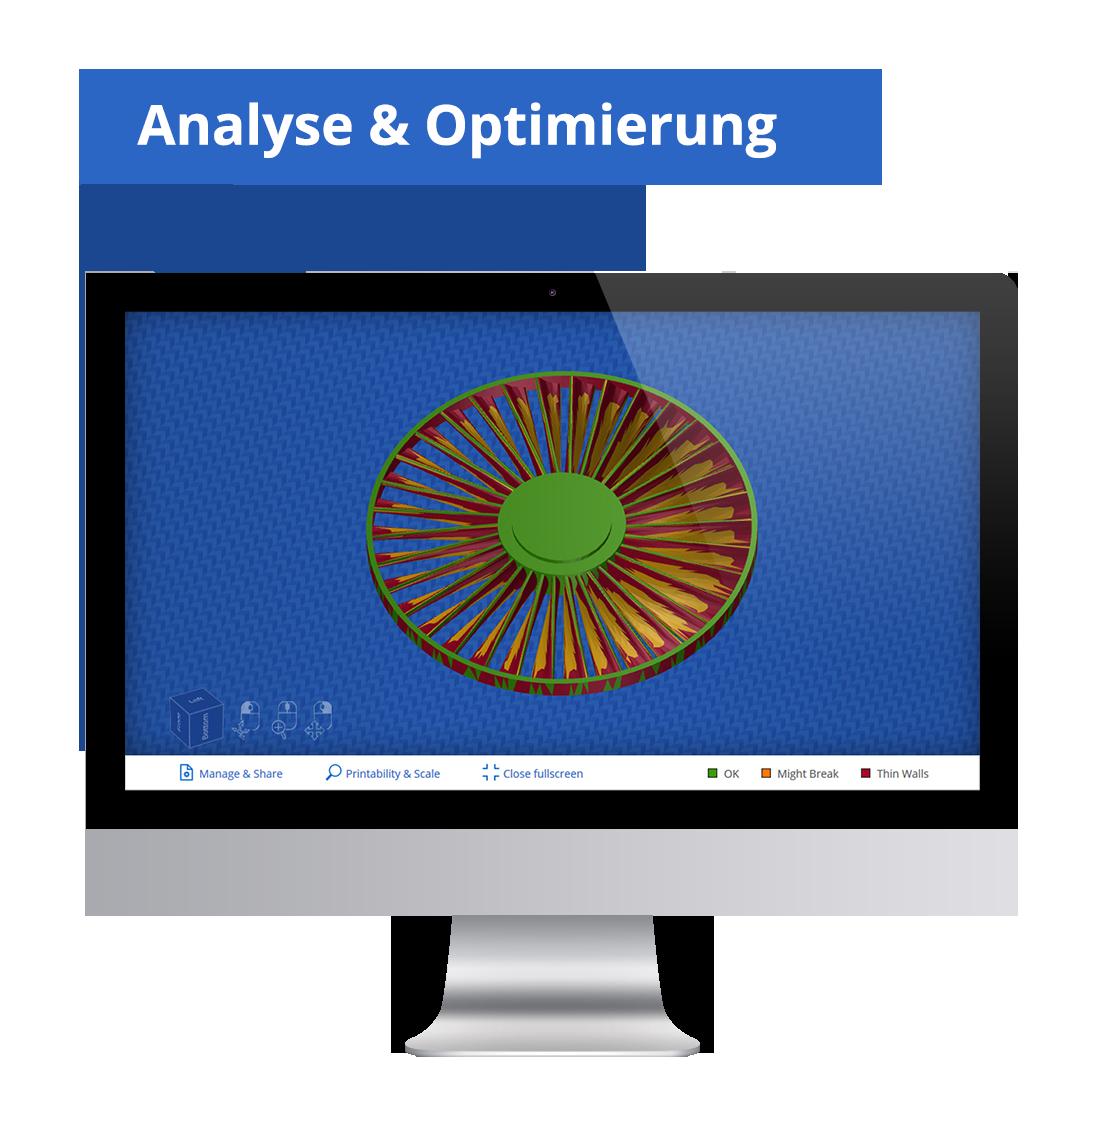 analysis-and-optimization.png